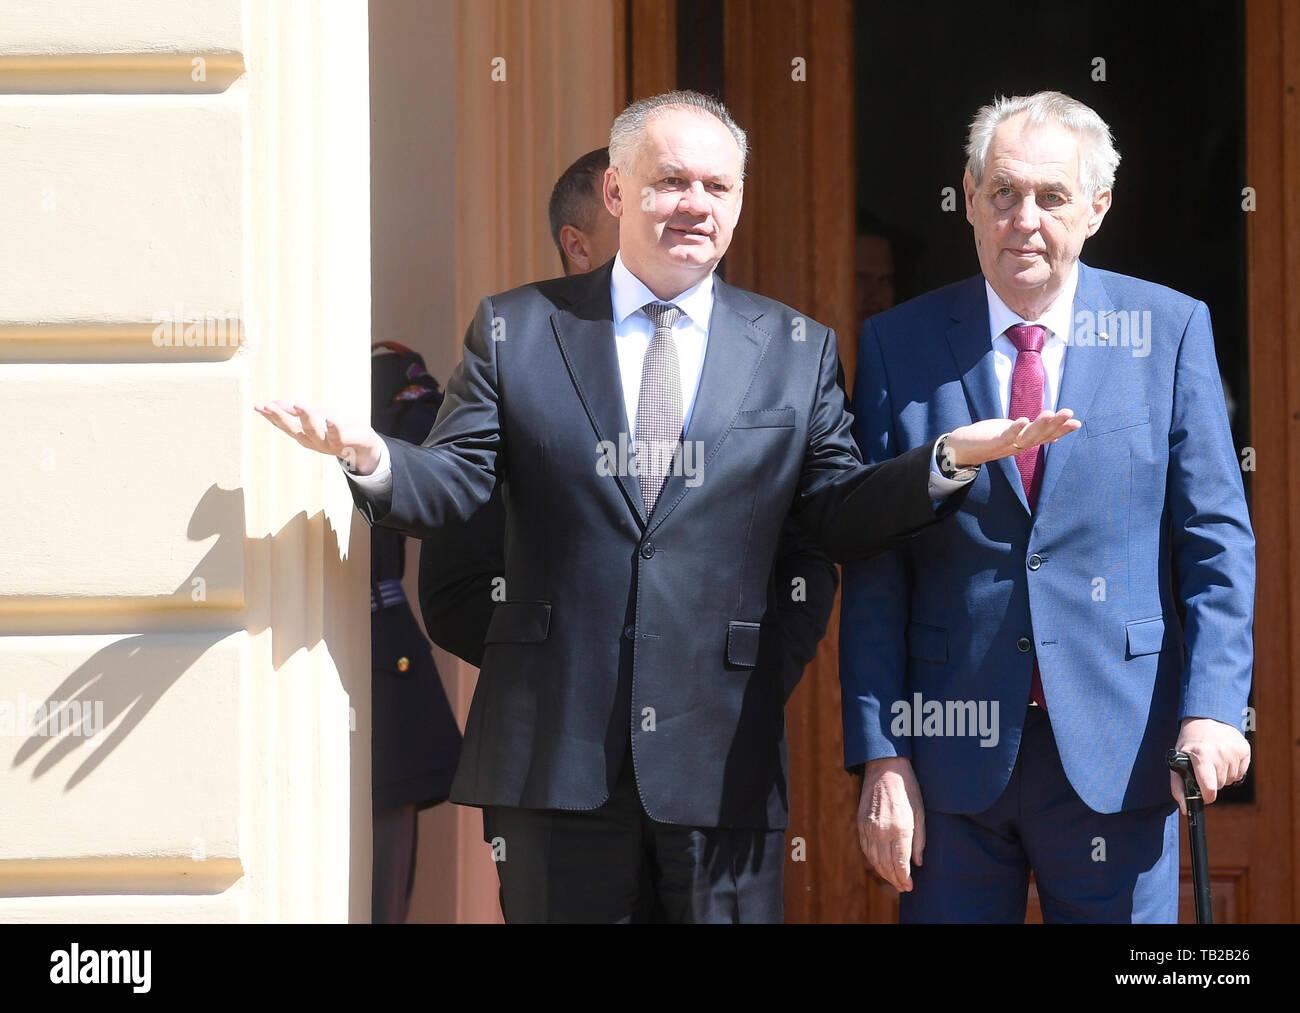 Lany, Czech Republic. 30th May, 2019. Slovak President Andrej Kiska visits Czech Republic and meets Czech President Milos Zeman (right) before his mandate ends in Lany, Czech Republic, May 30, 2019. Credit: Michal Krumphanzl/CTK Photo/Alamy Live News Stock Photo